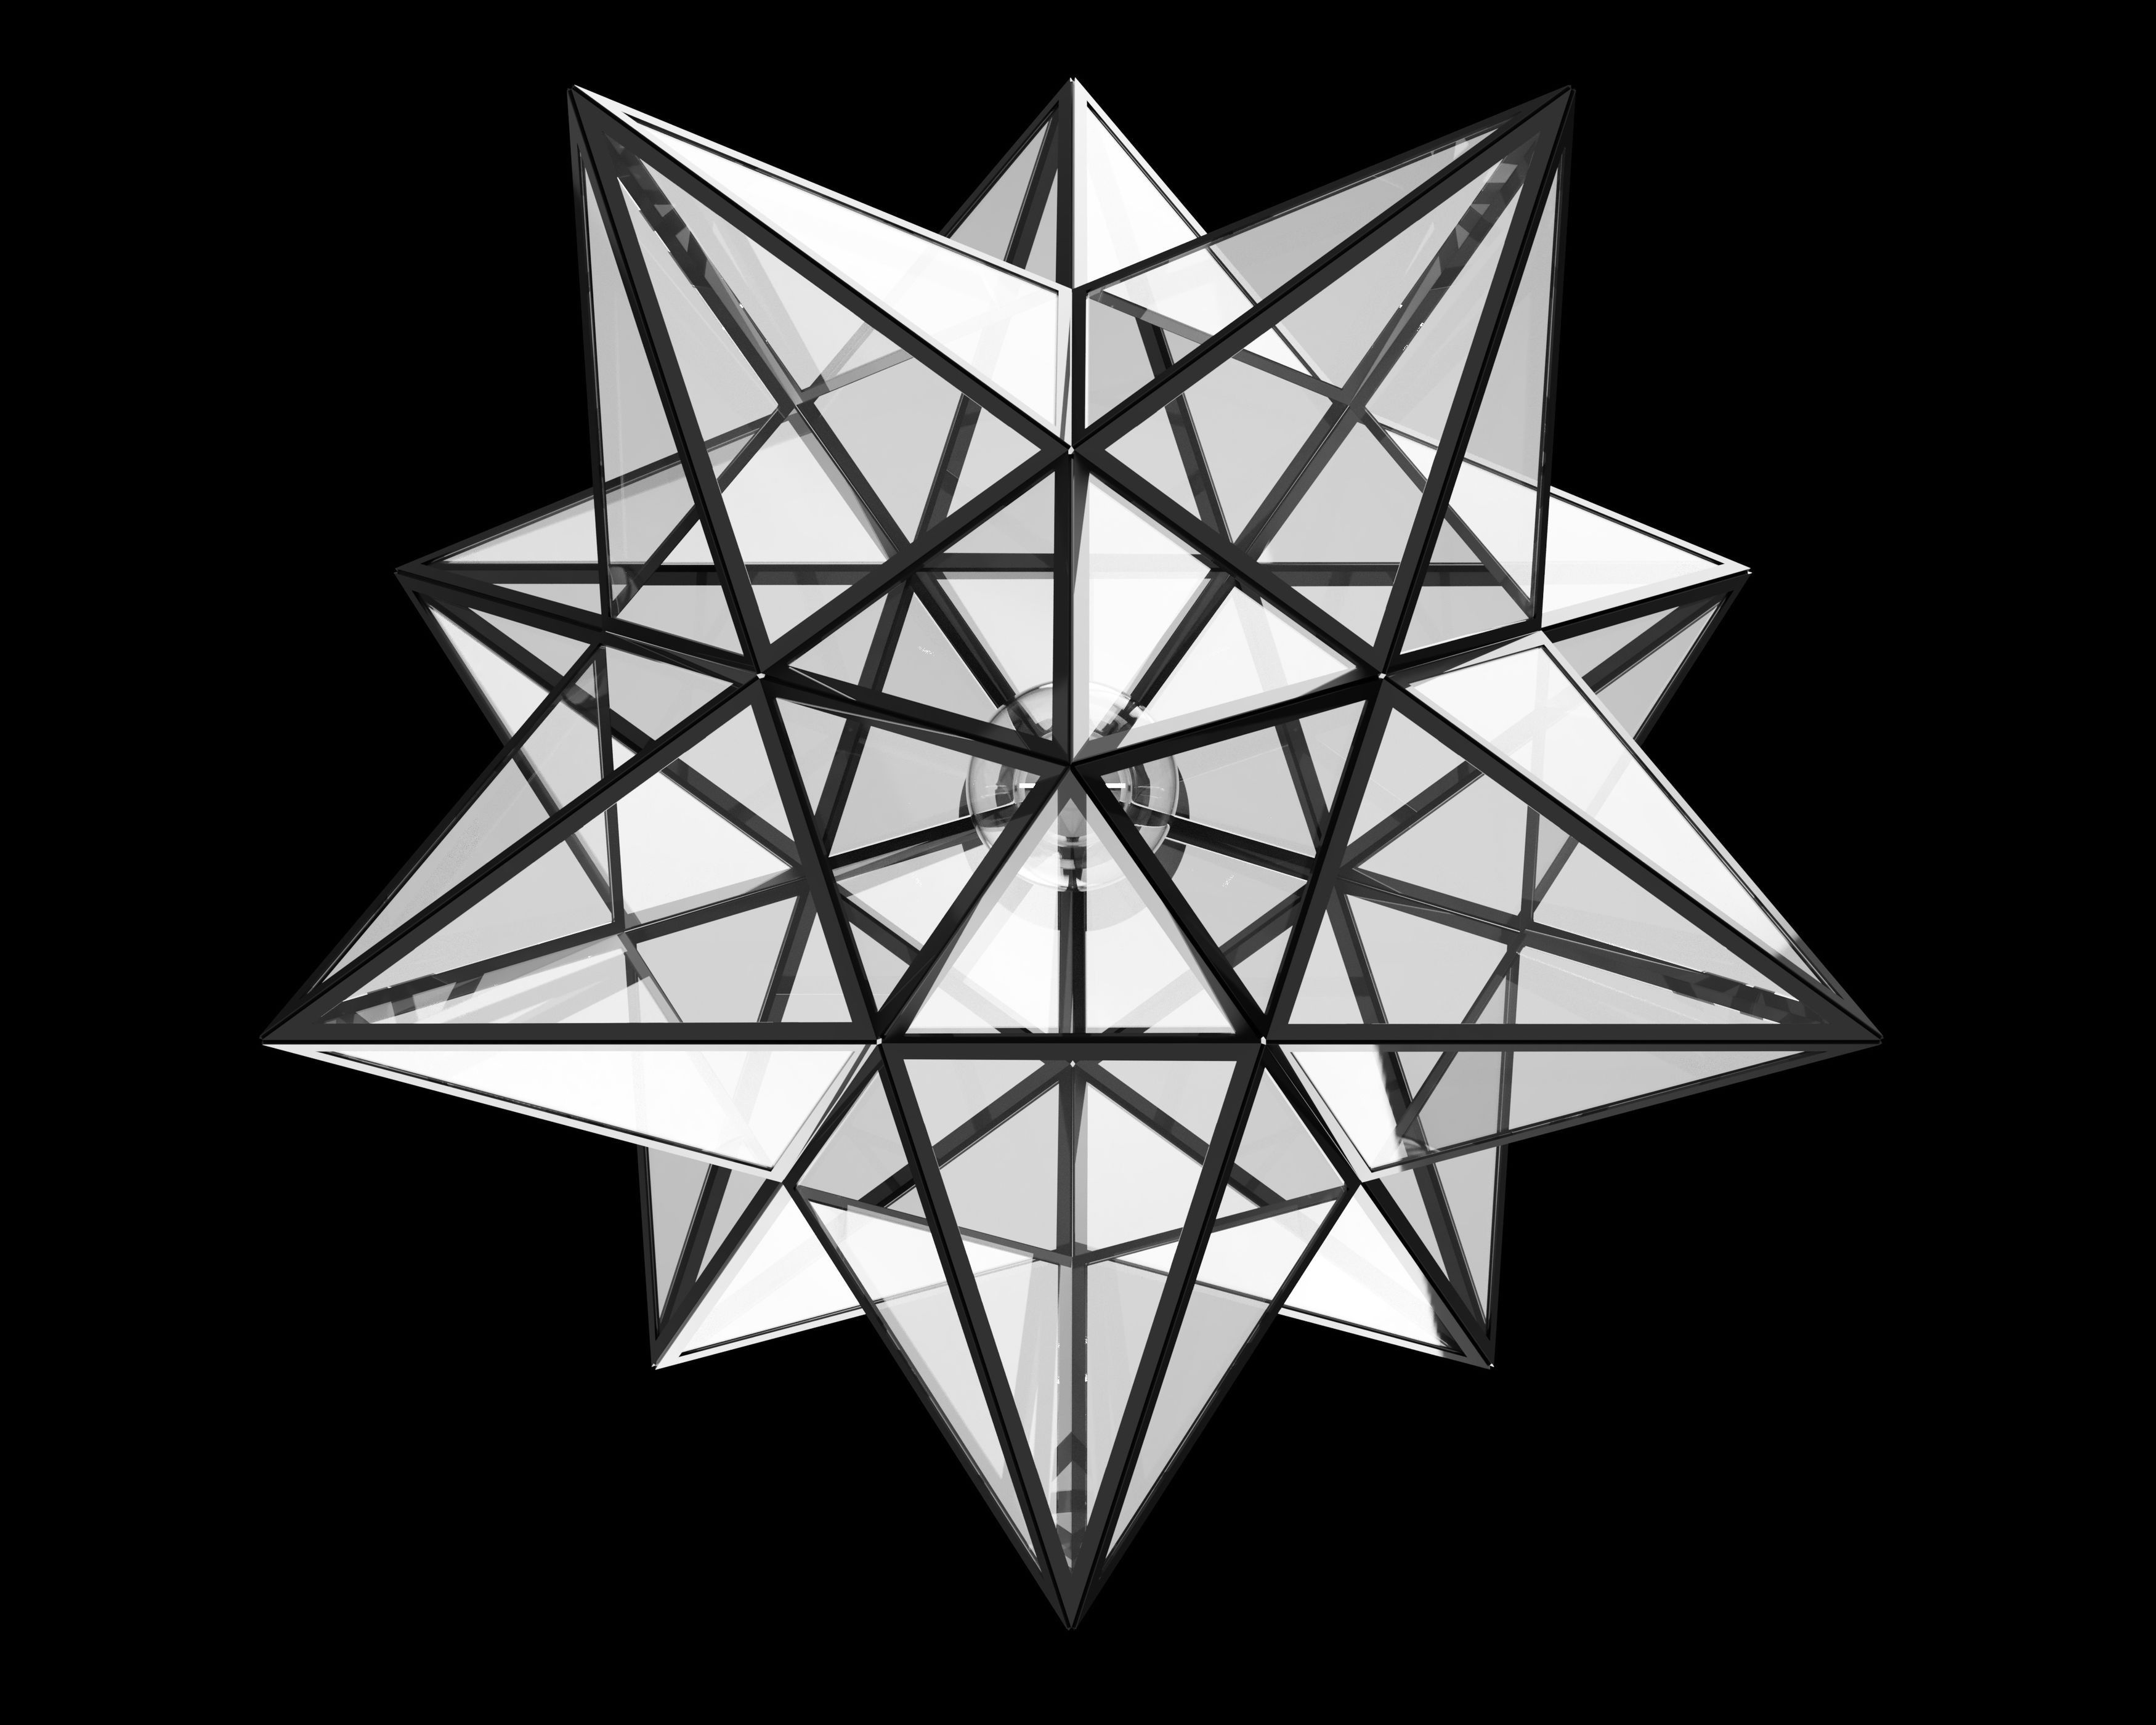 Stjarna-mindre-2019-apr-13-12-19-57am-000-customizedview6052131453-jpg-3500-3500